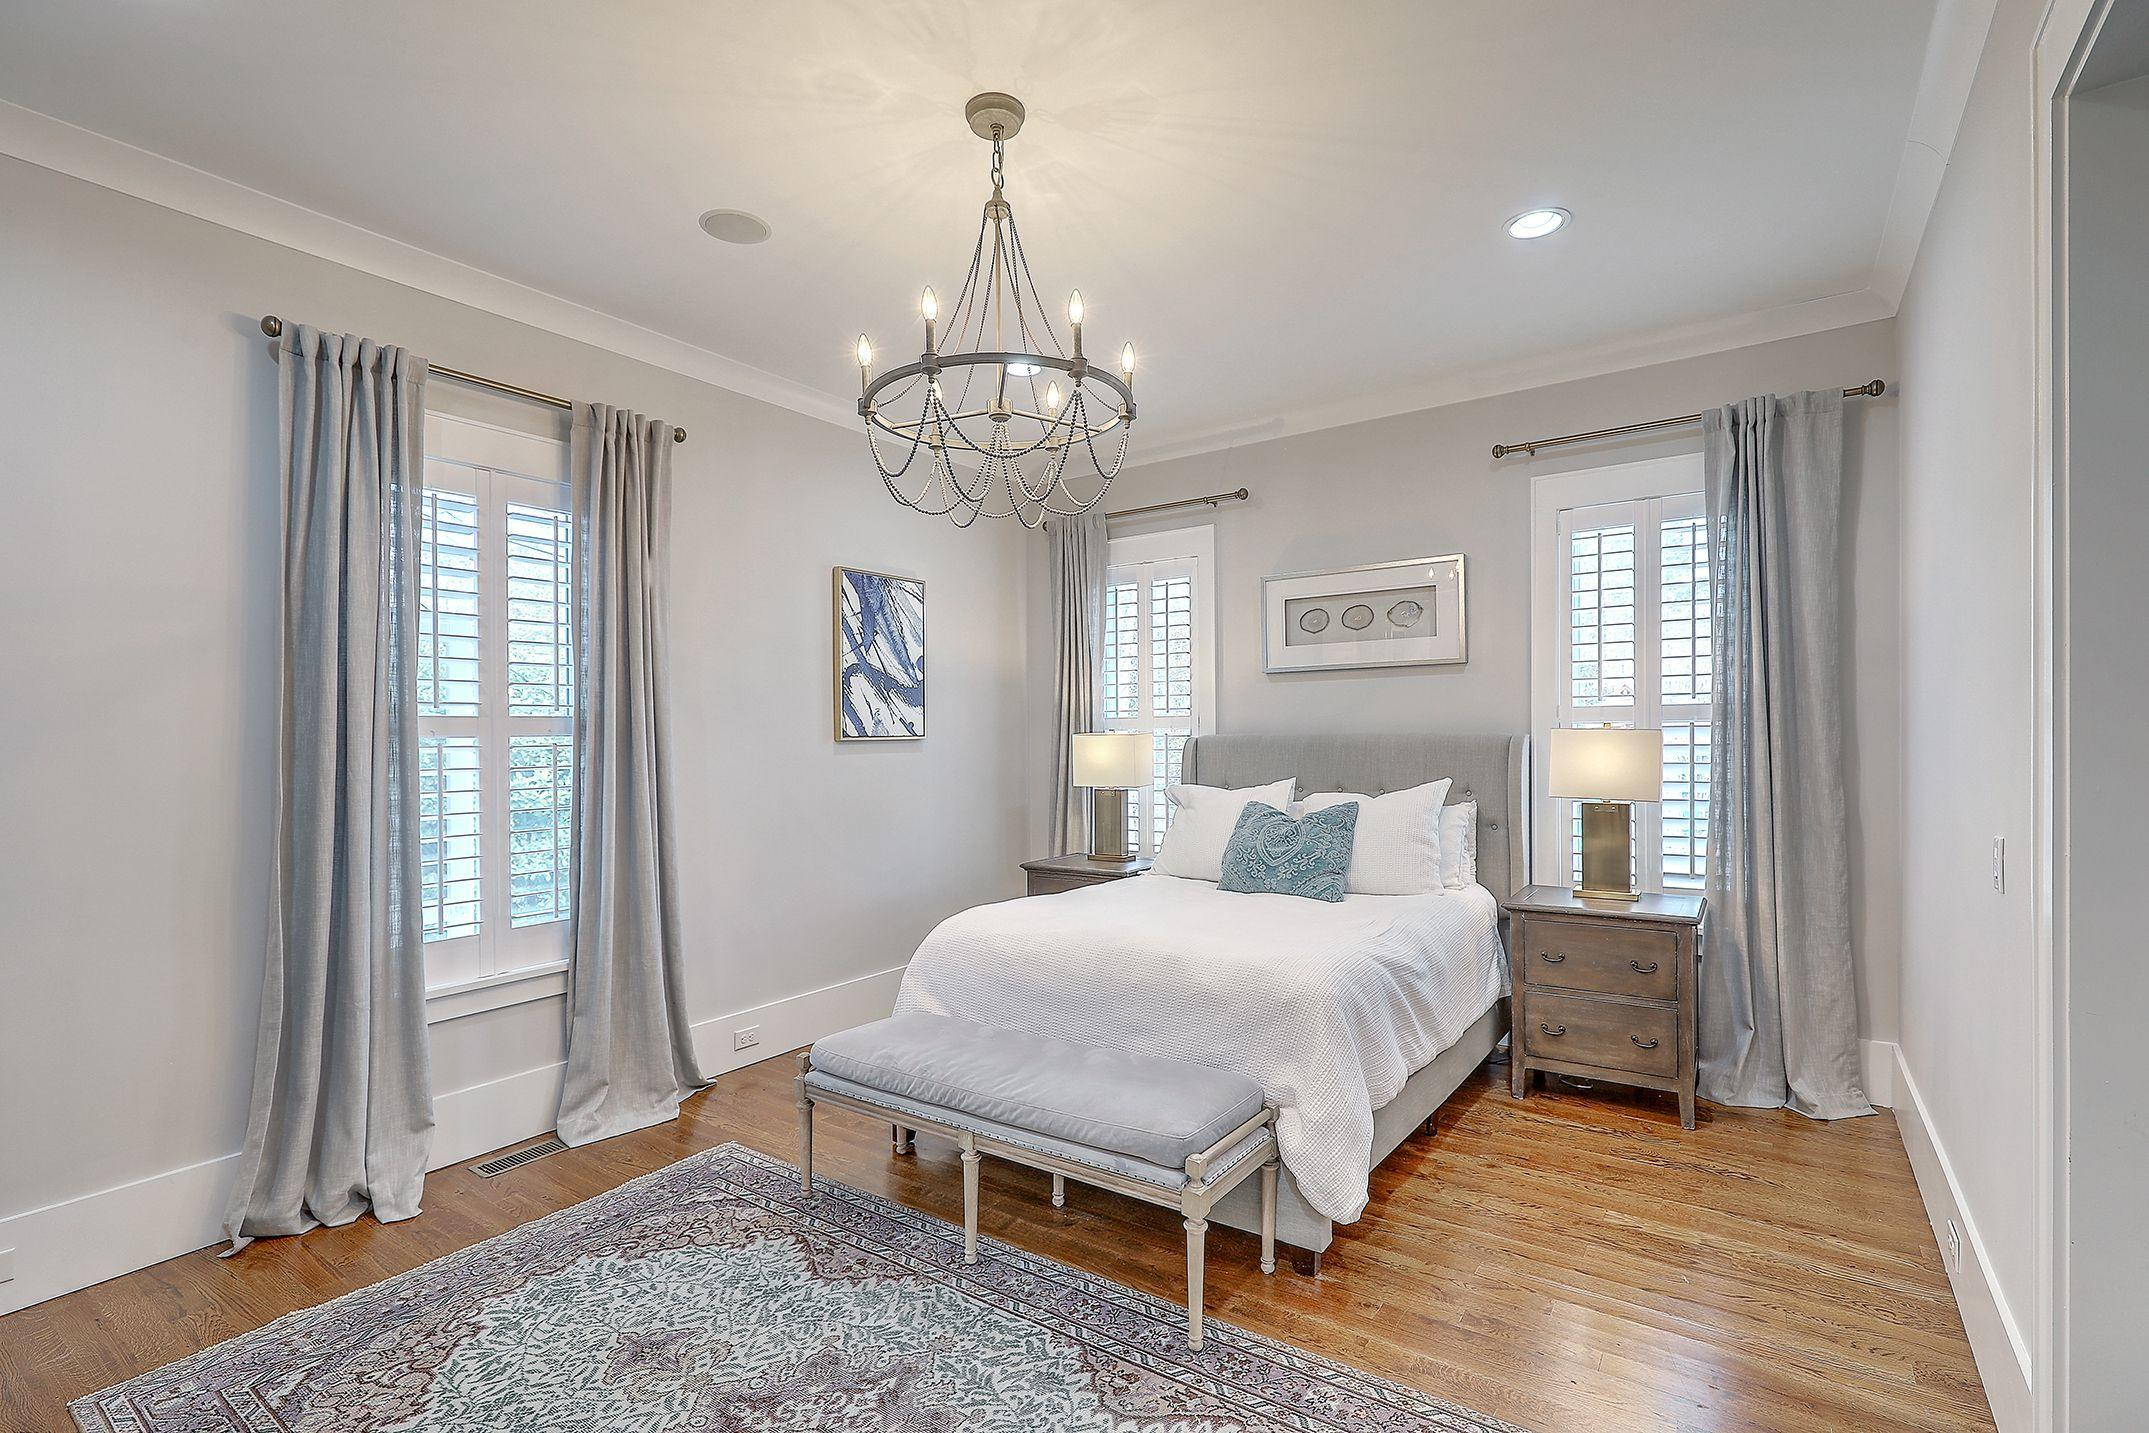 Carolina Park Homes For Sale - 1466 Gunnison, Mount Pleasant, SC - 51